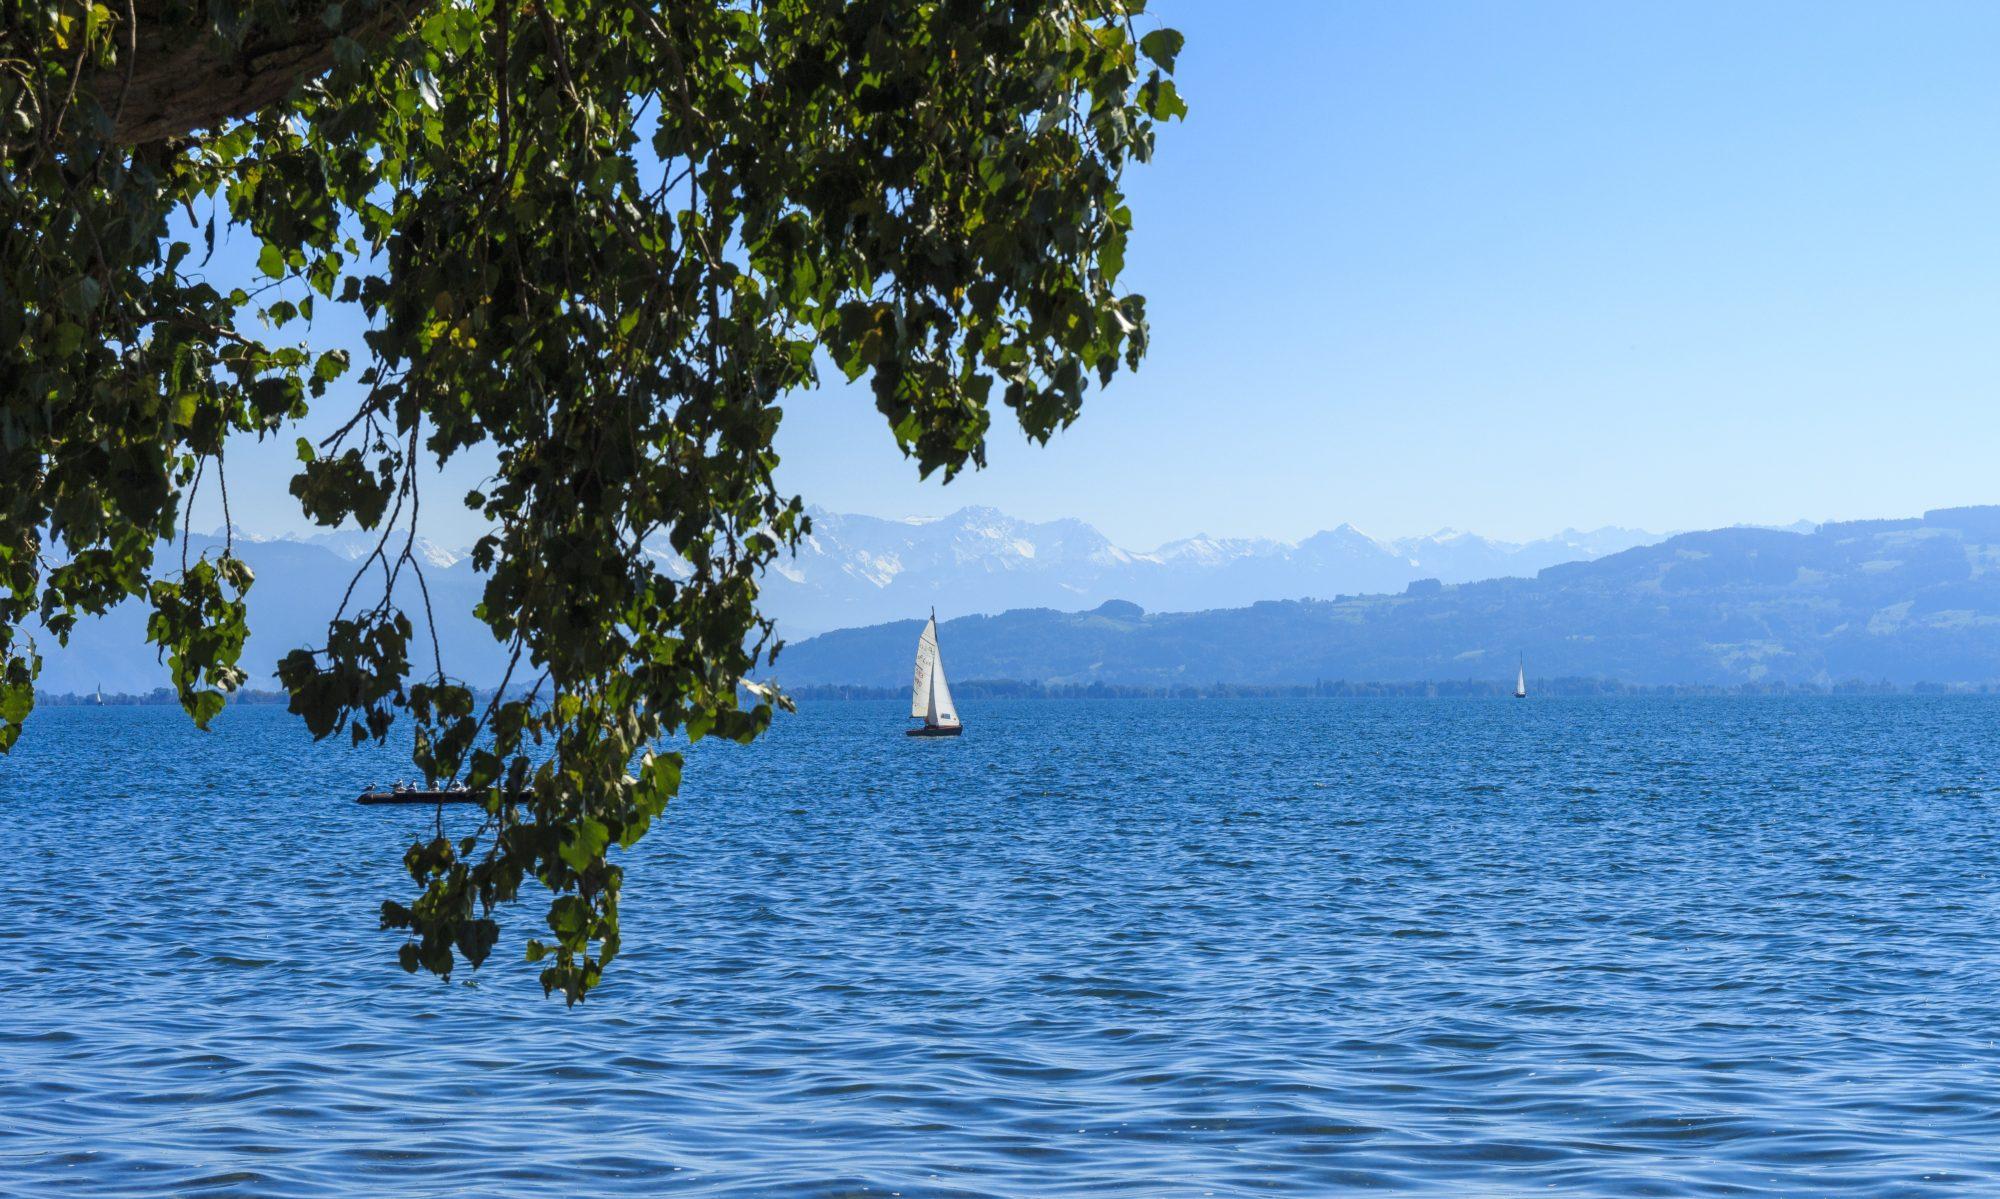 Destek Bodensee